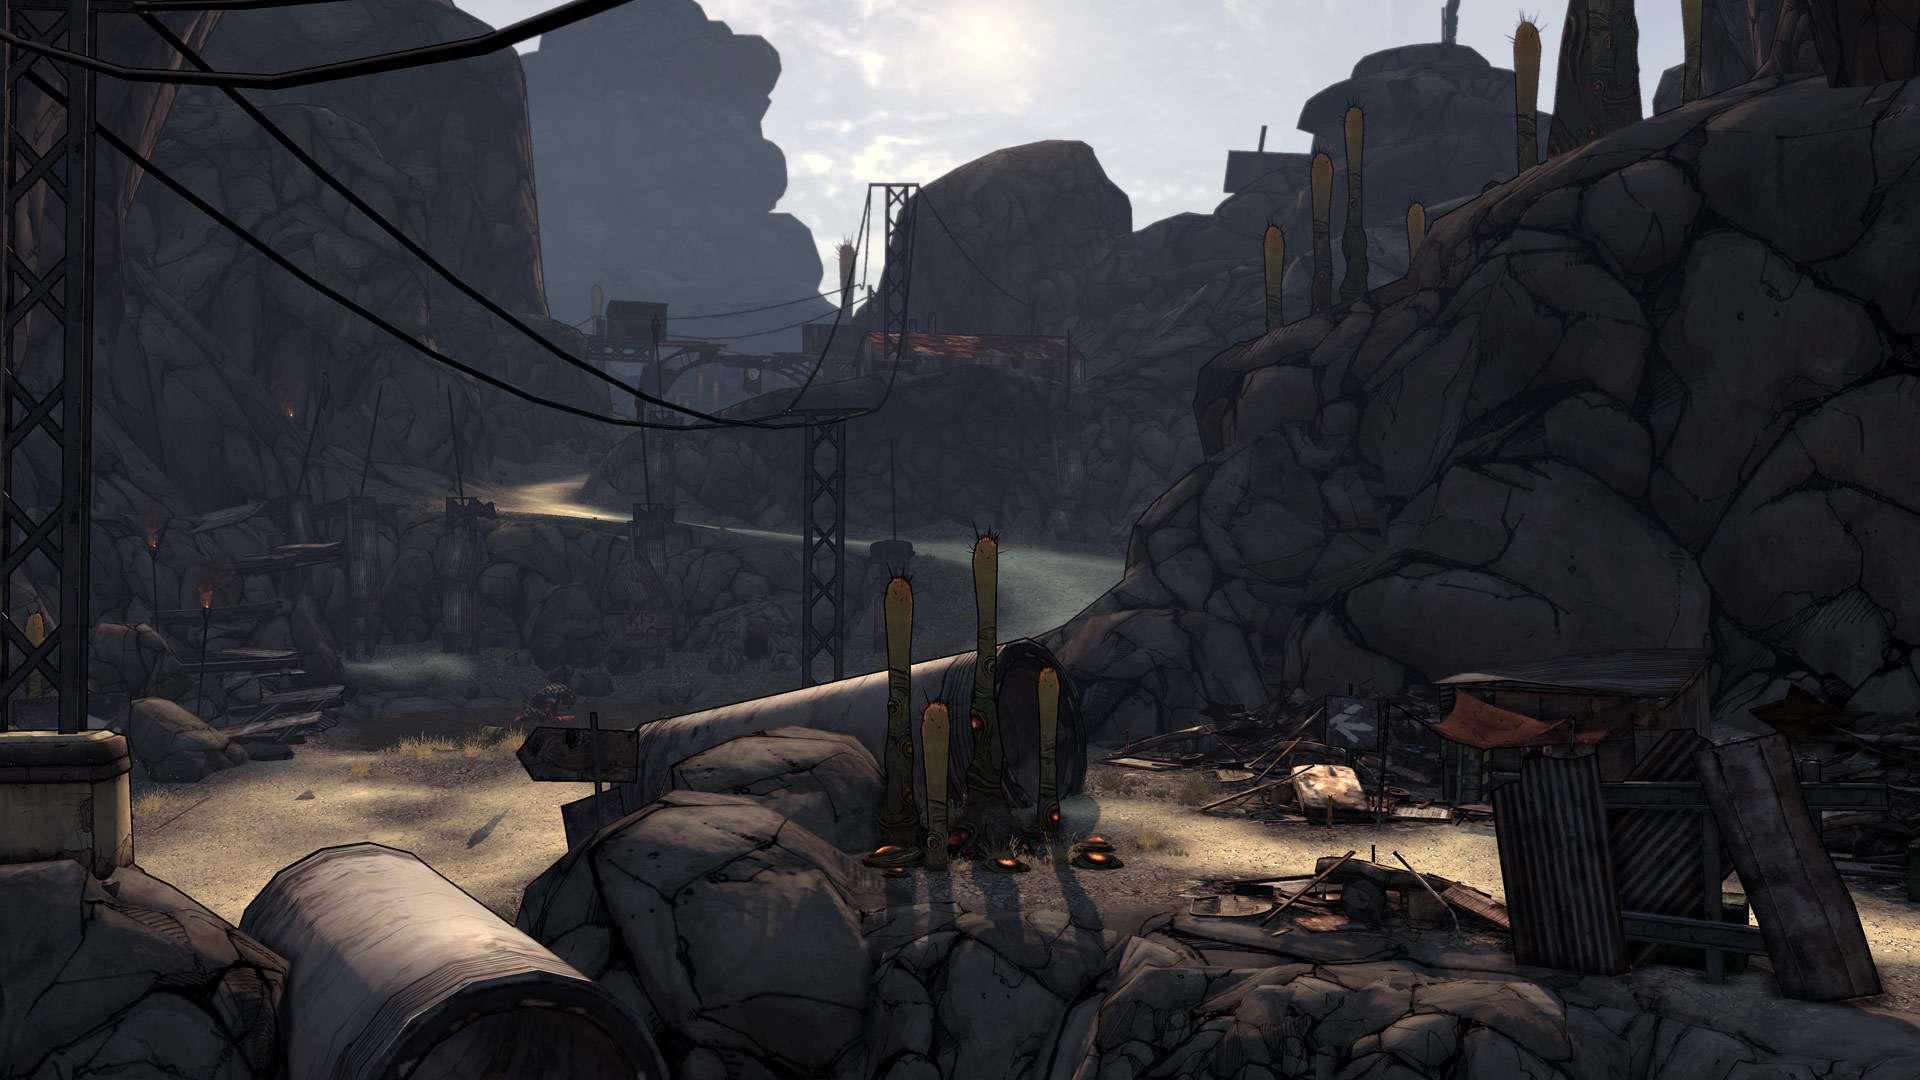 Screenshot from Borderlands (7/10)